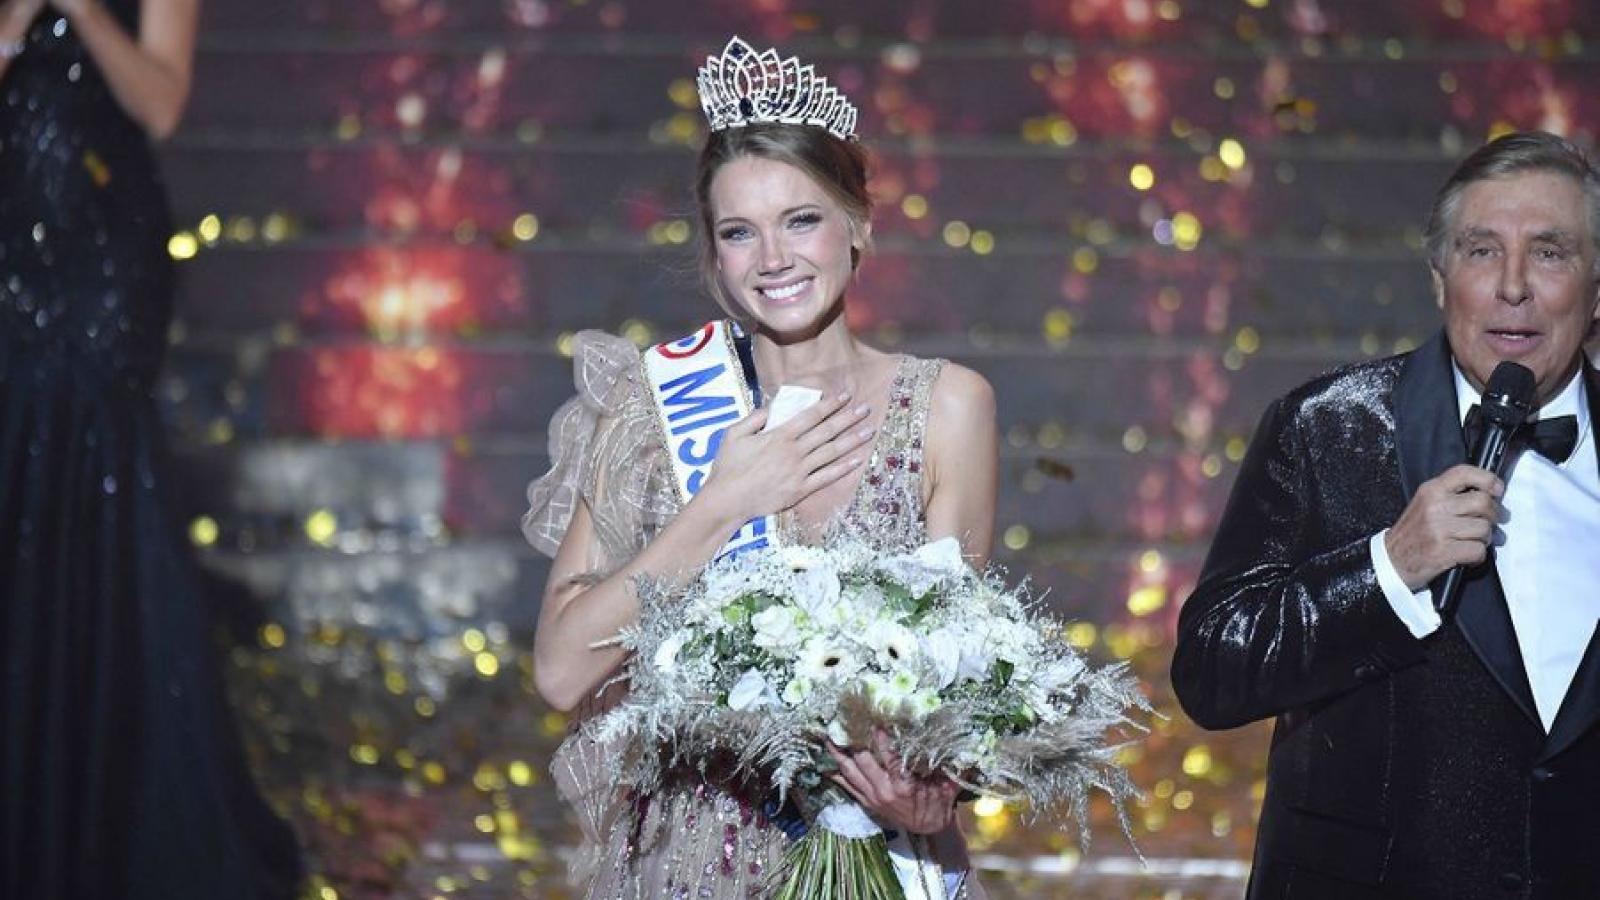 Sắc vóc Hoa hậu Pháp 2020